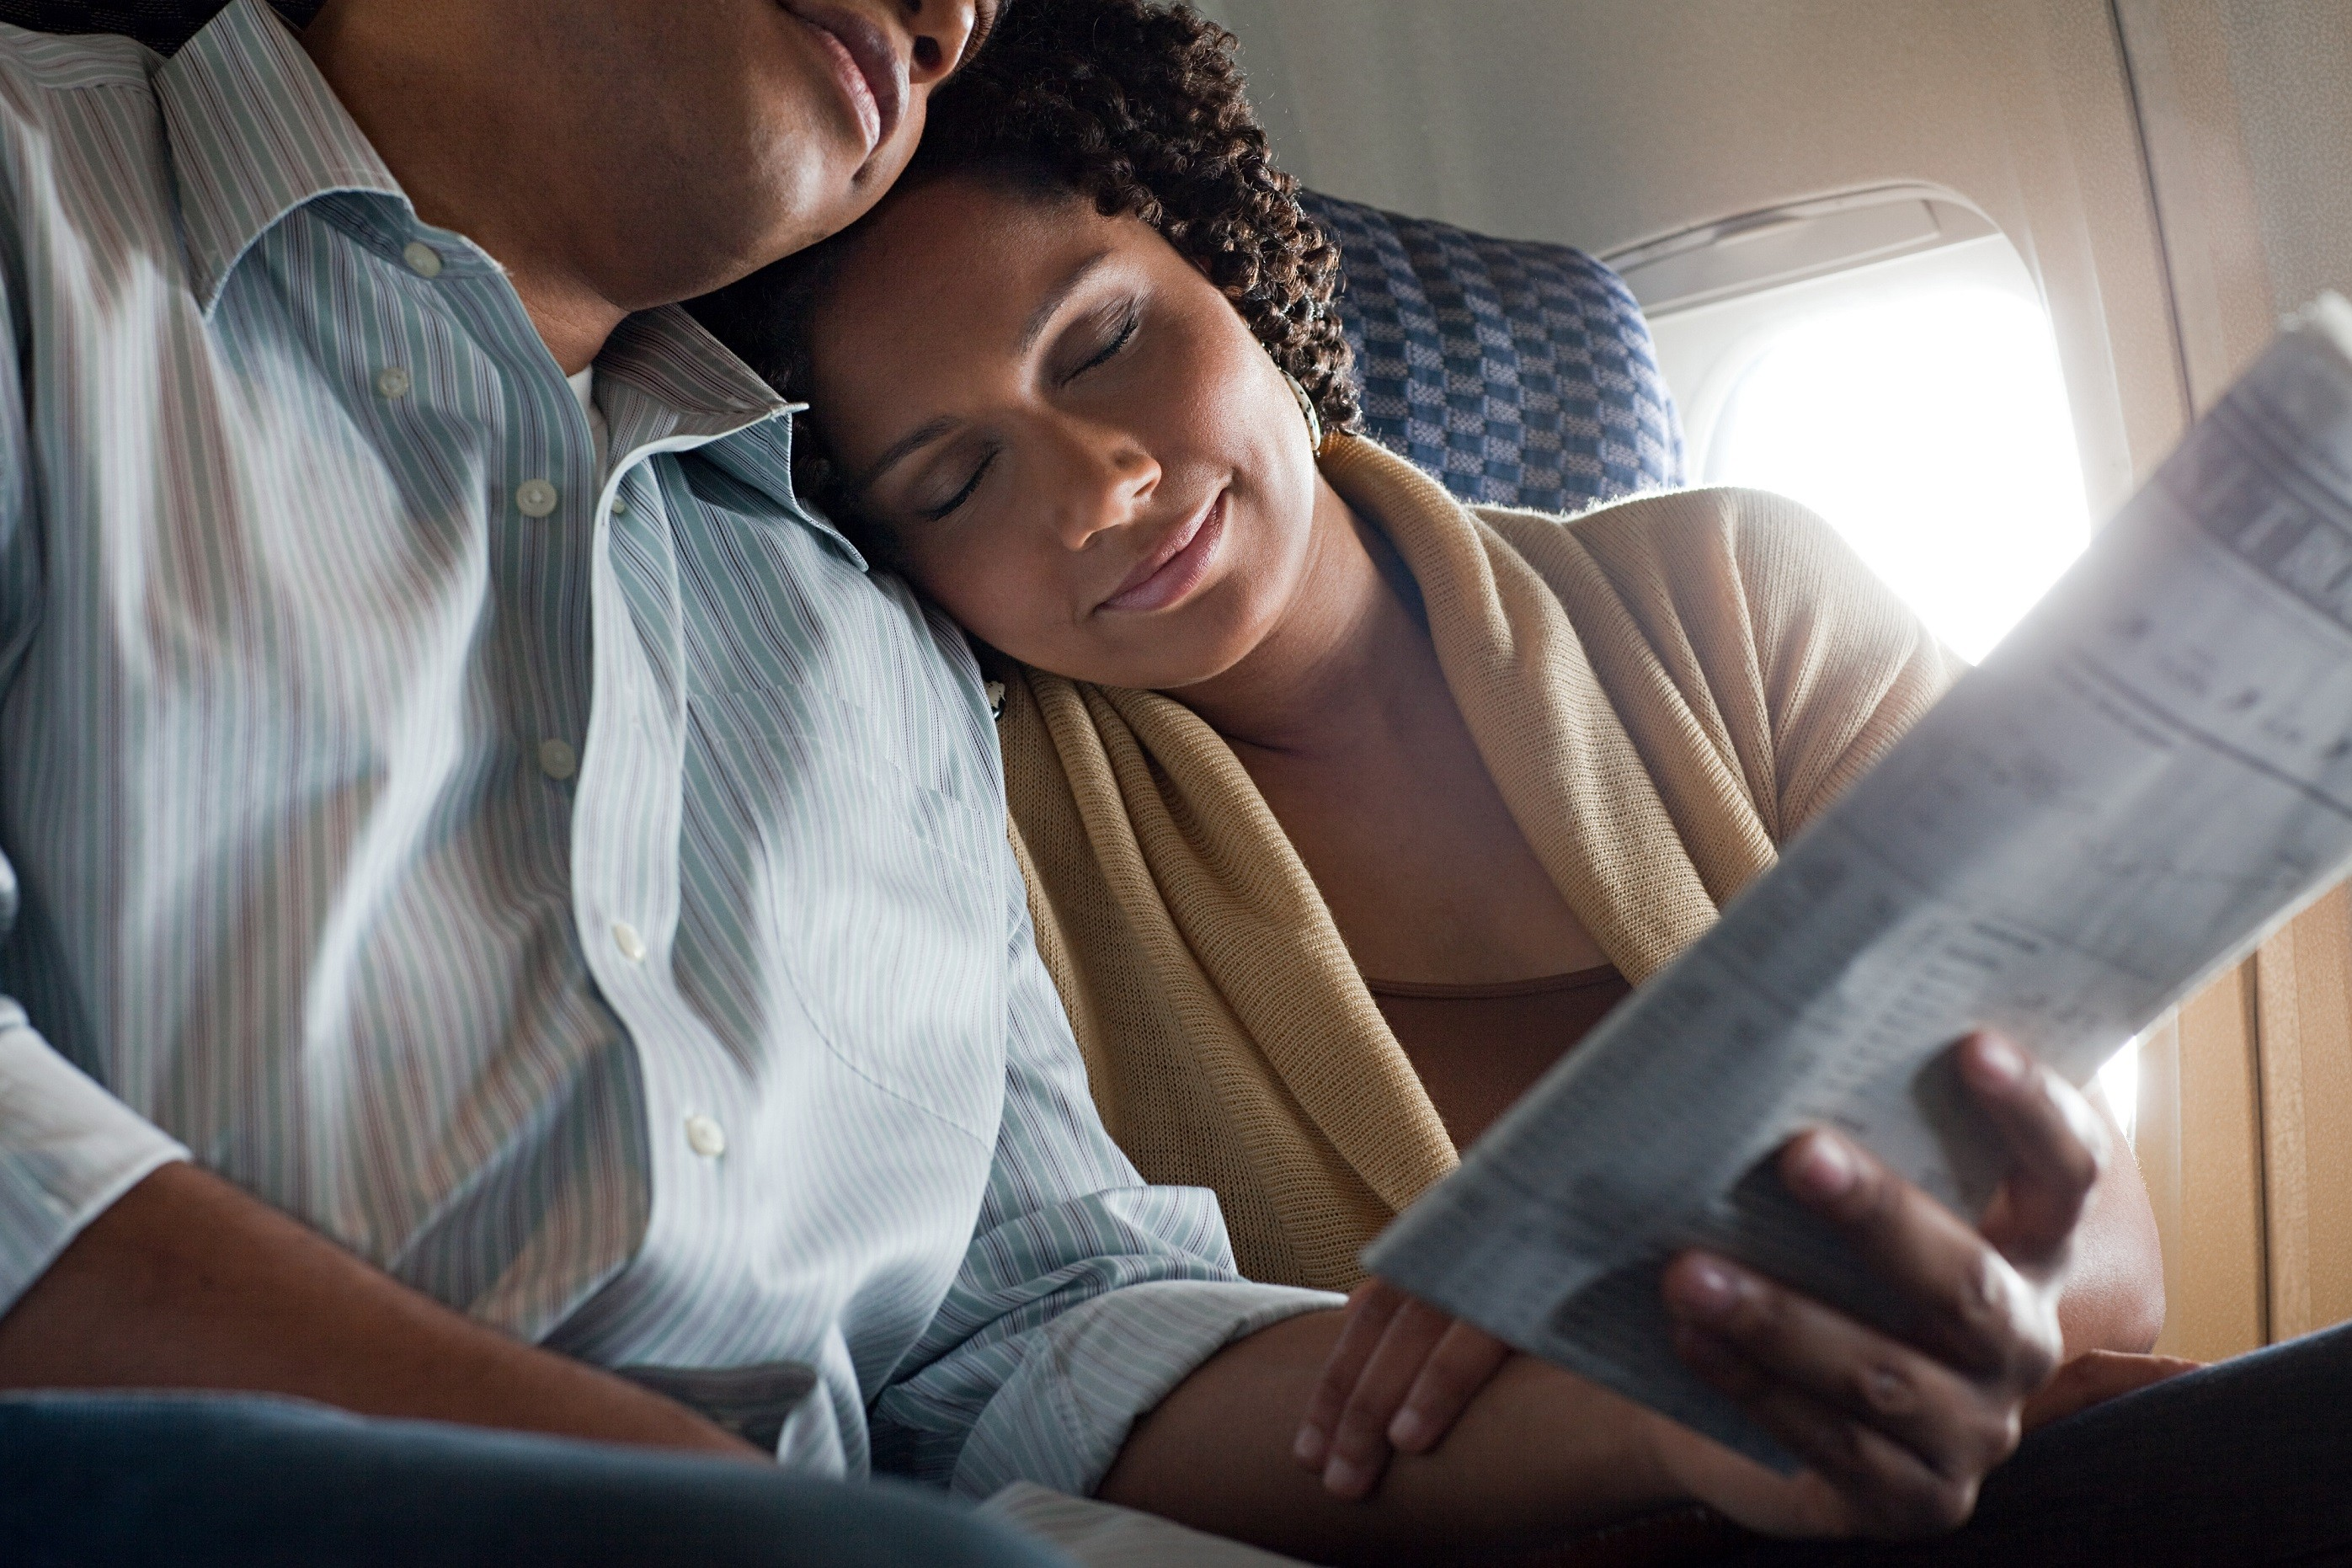 Happy couple on a plane